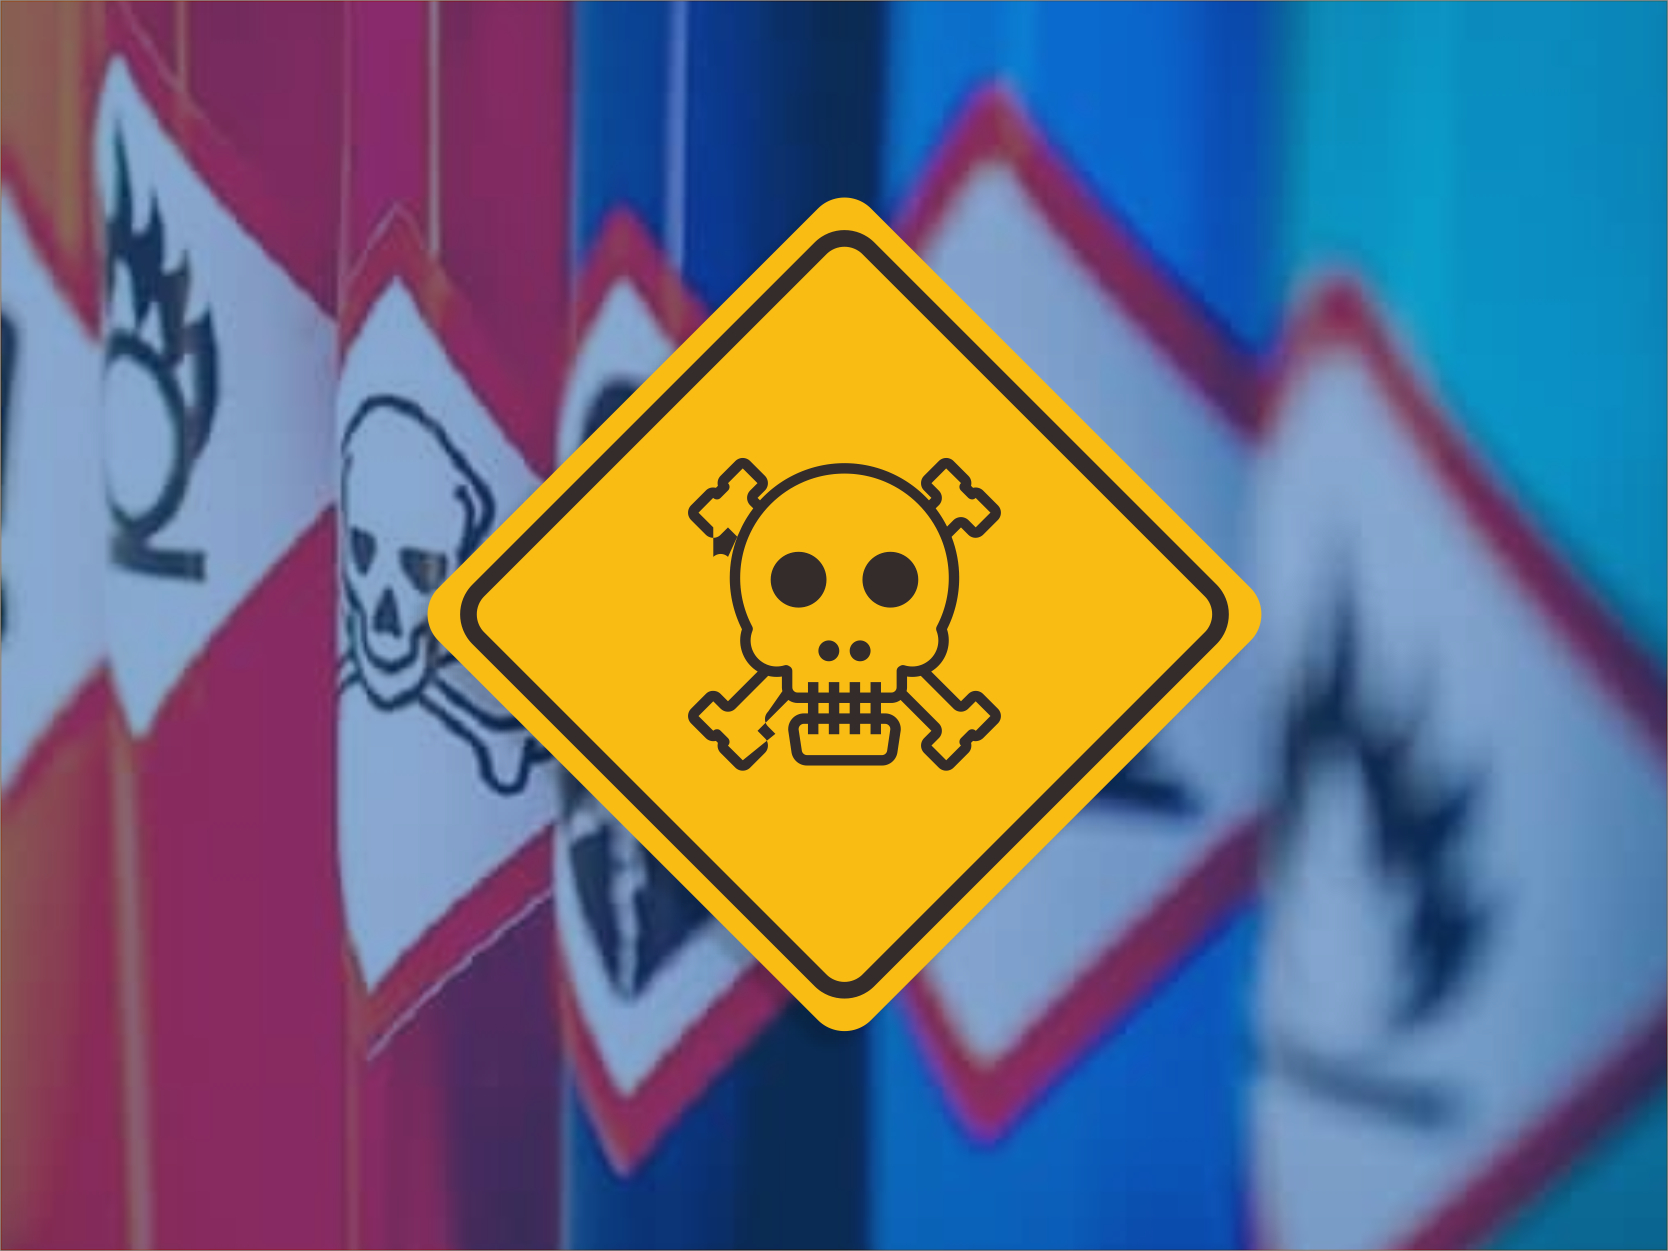 Bahan Kimia Berbahaya Yang Wajib Kamu Ketahui